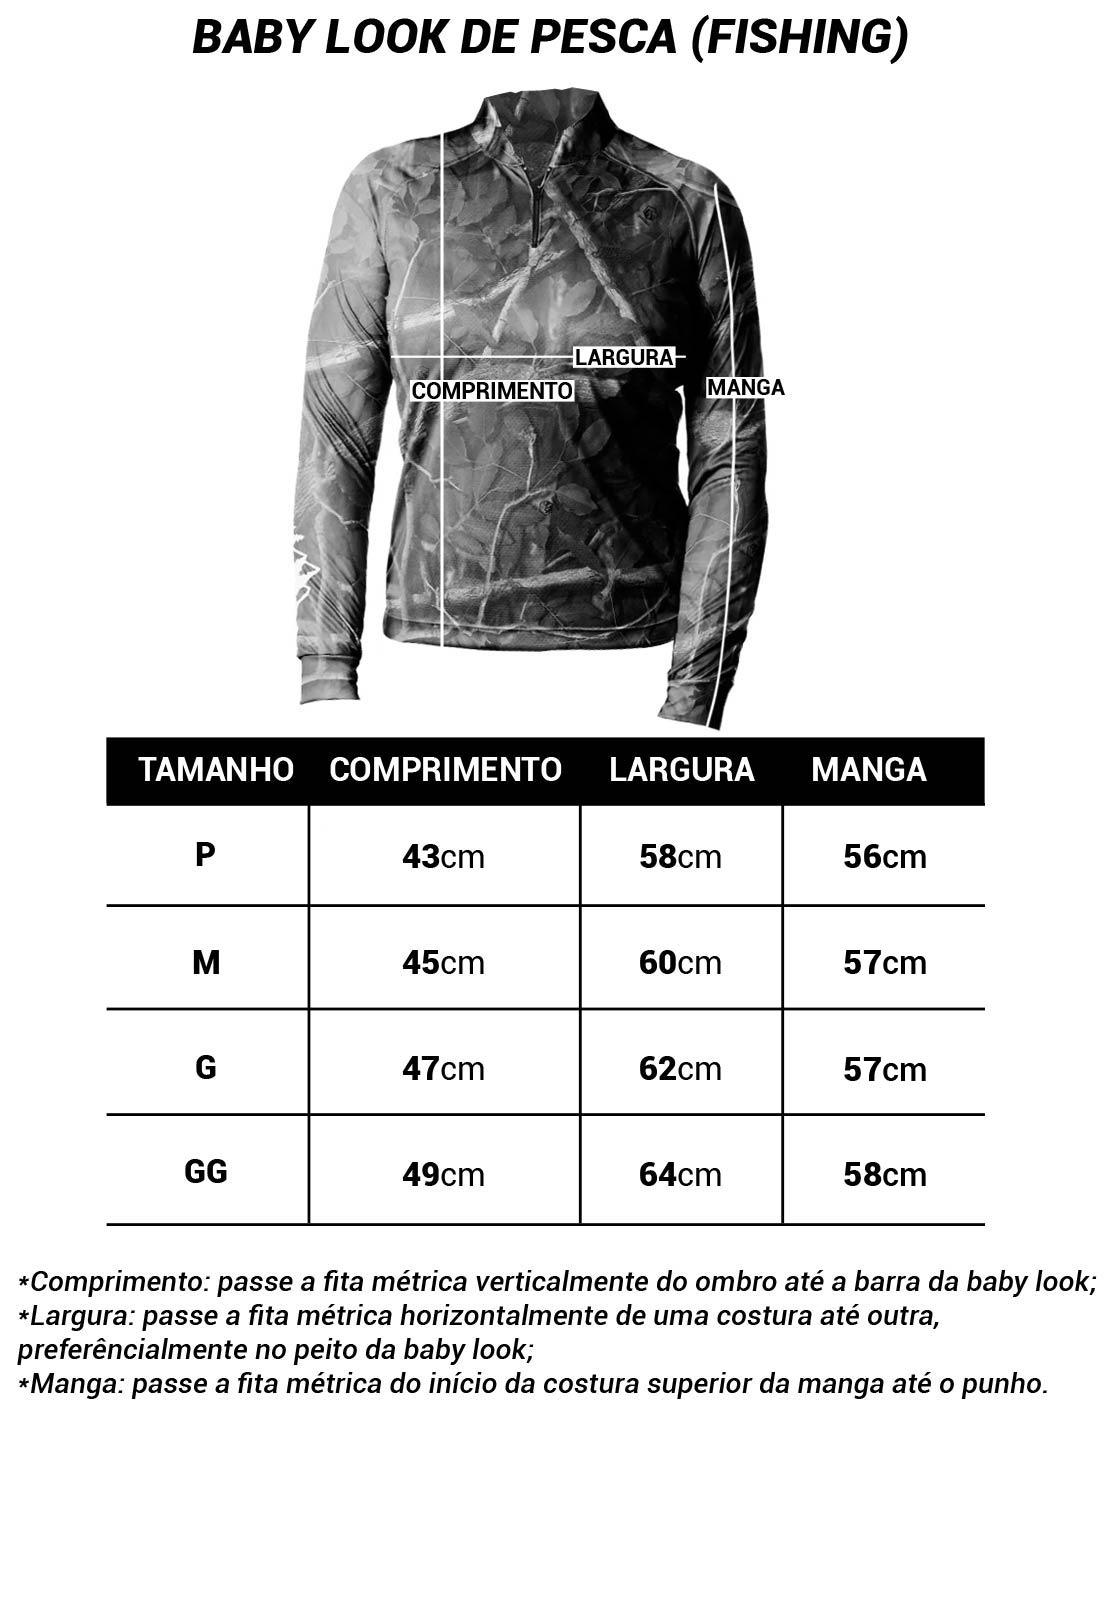 CAMISA DE PESCA FISH TECH PRO 34 FEMININA + BANDANA GRÁTIS  - REAL HUNTER OUTDOORS